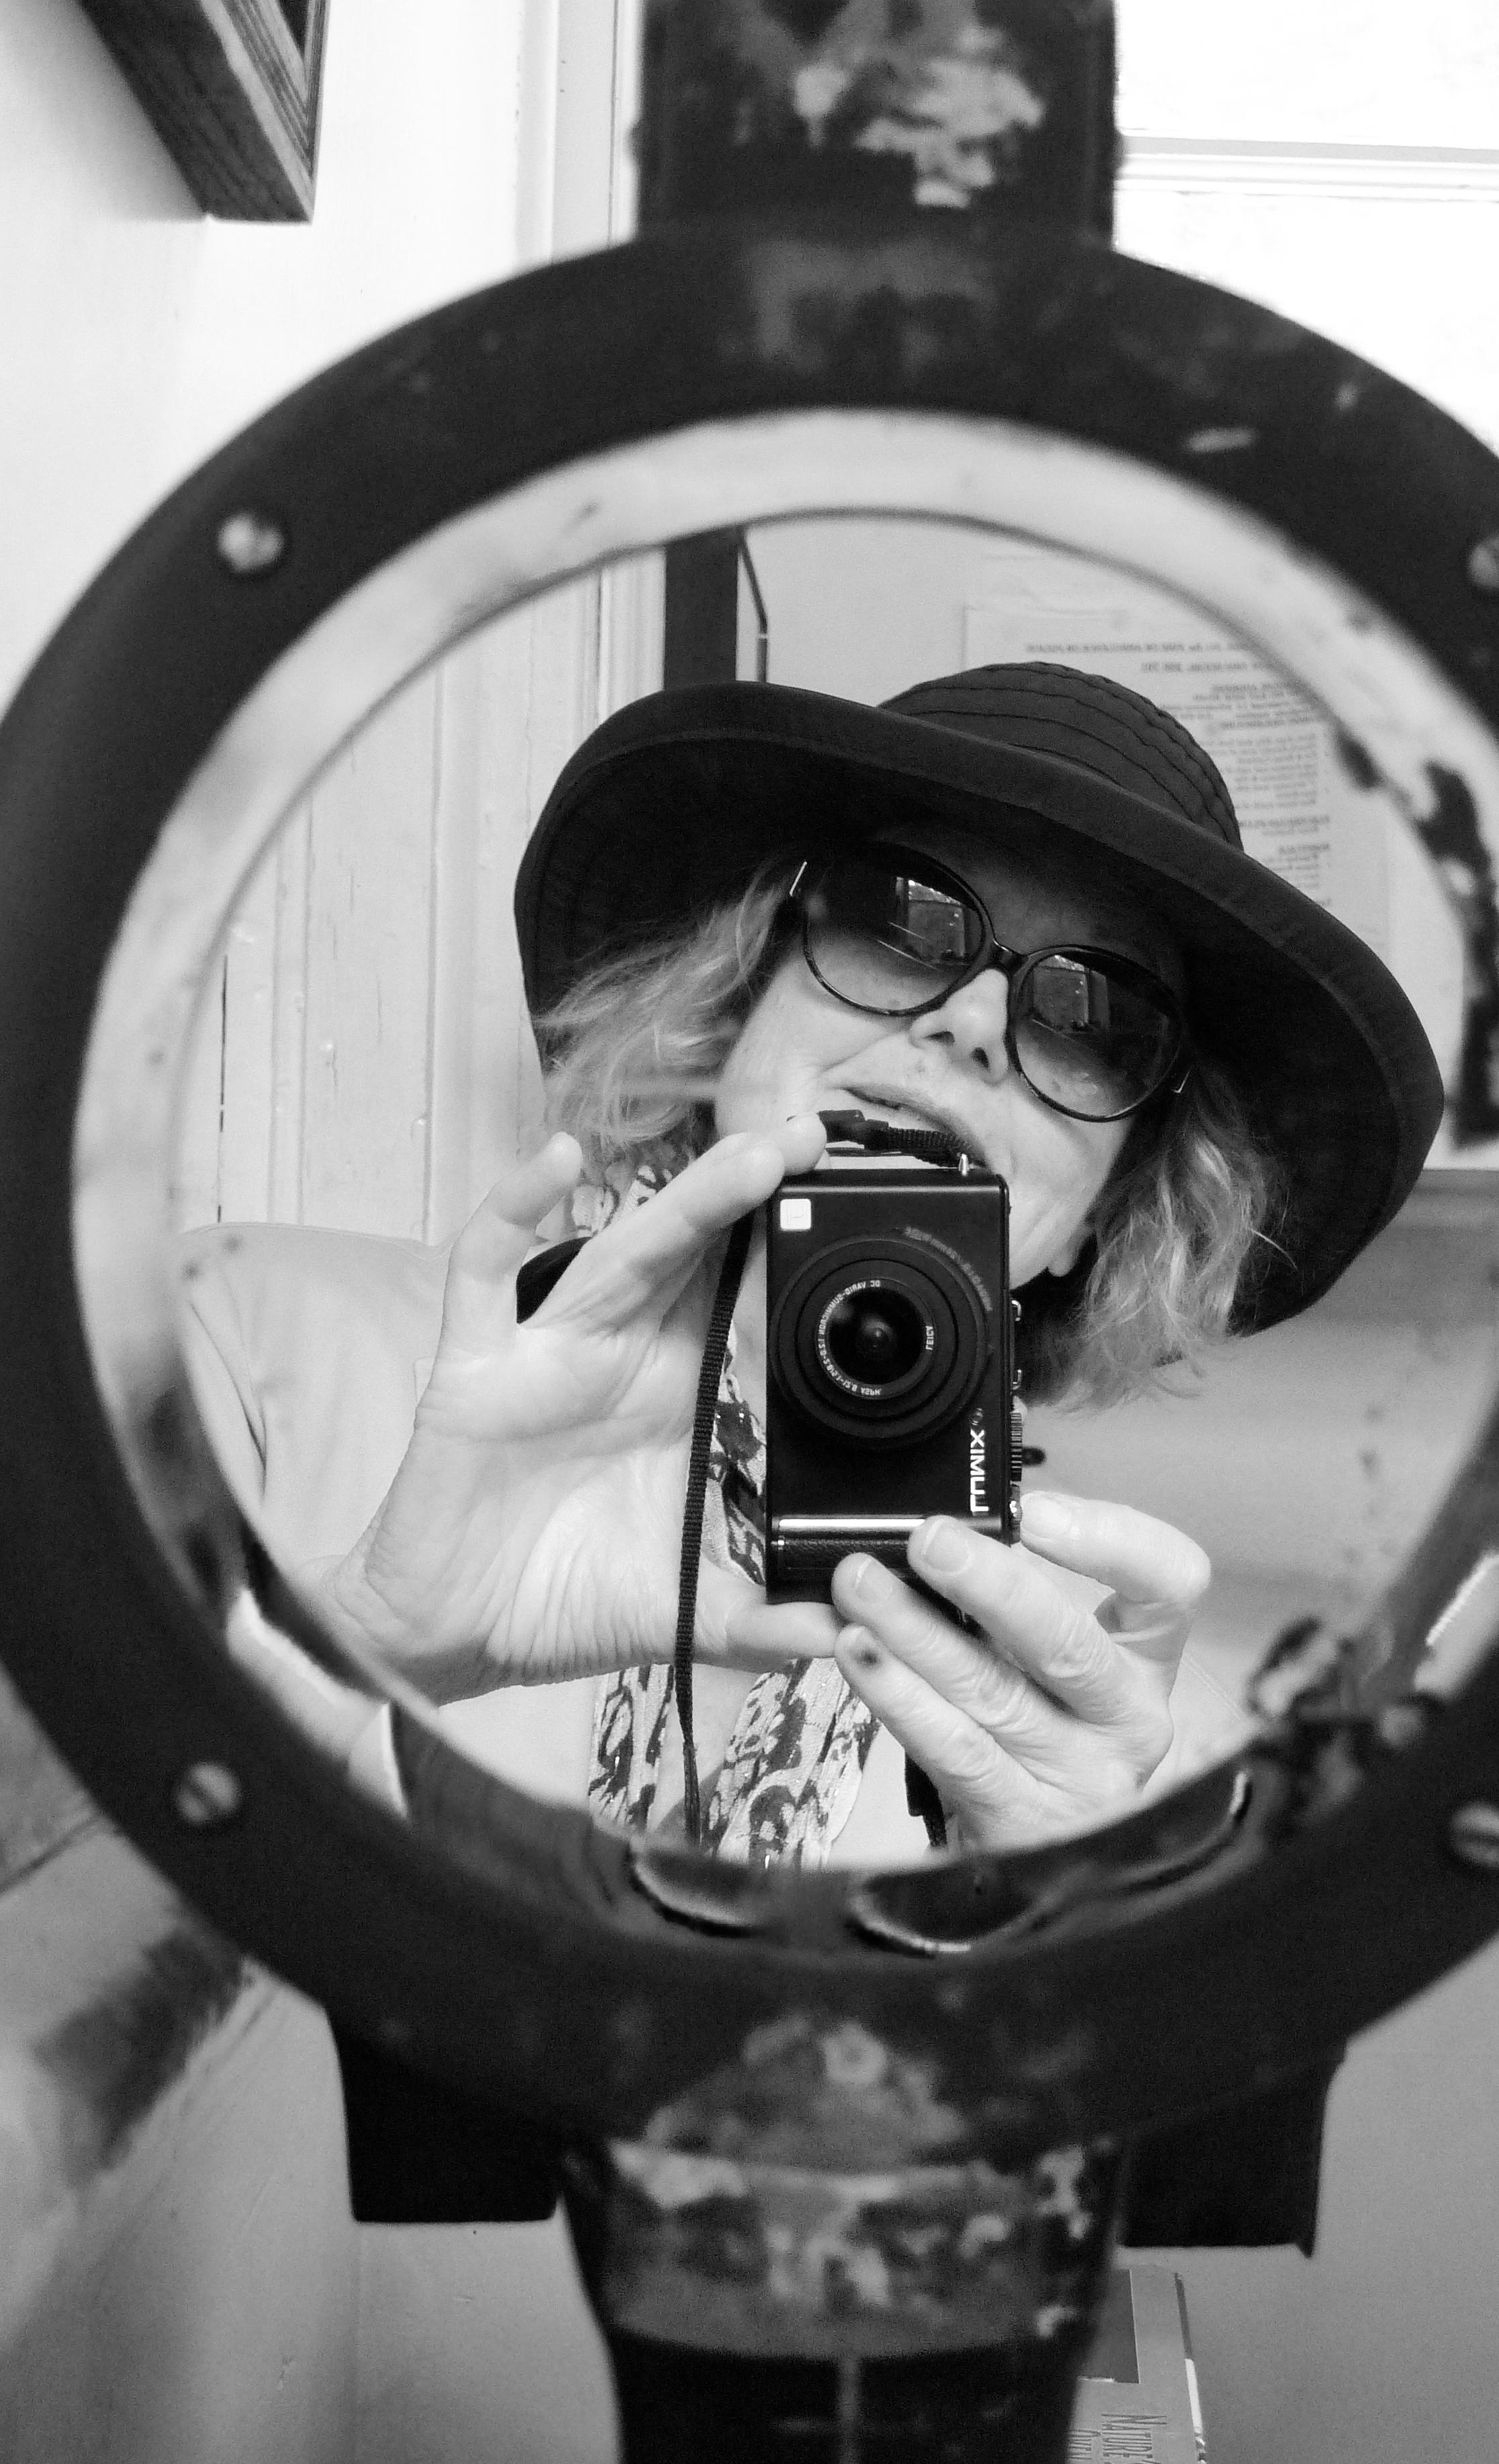 Self Portrait B&W Snapseed.jpg